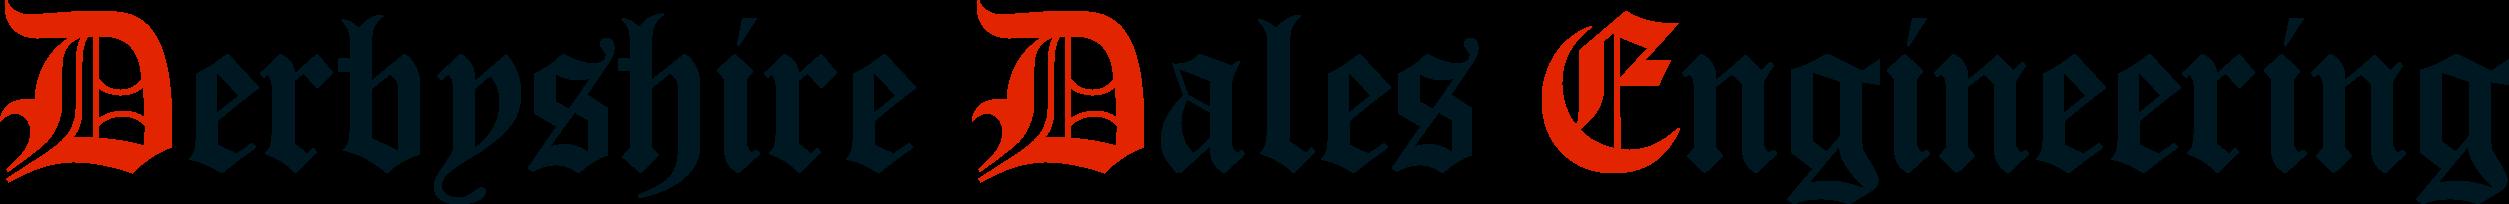 Derbyshire Dales Engineering (logo)